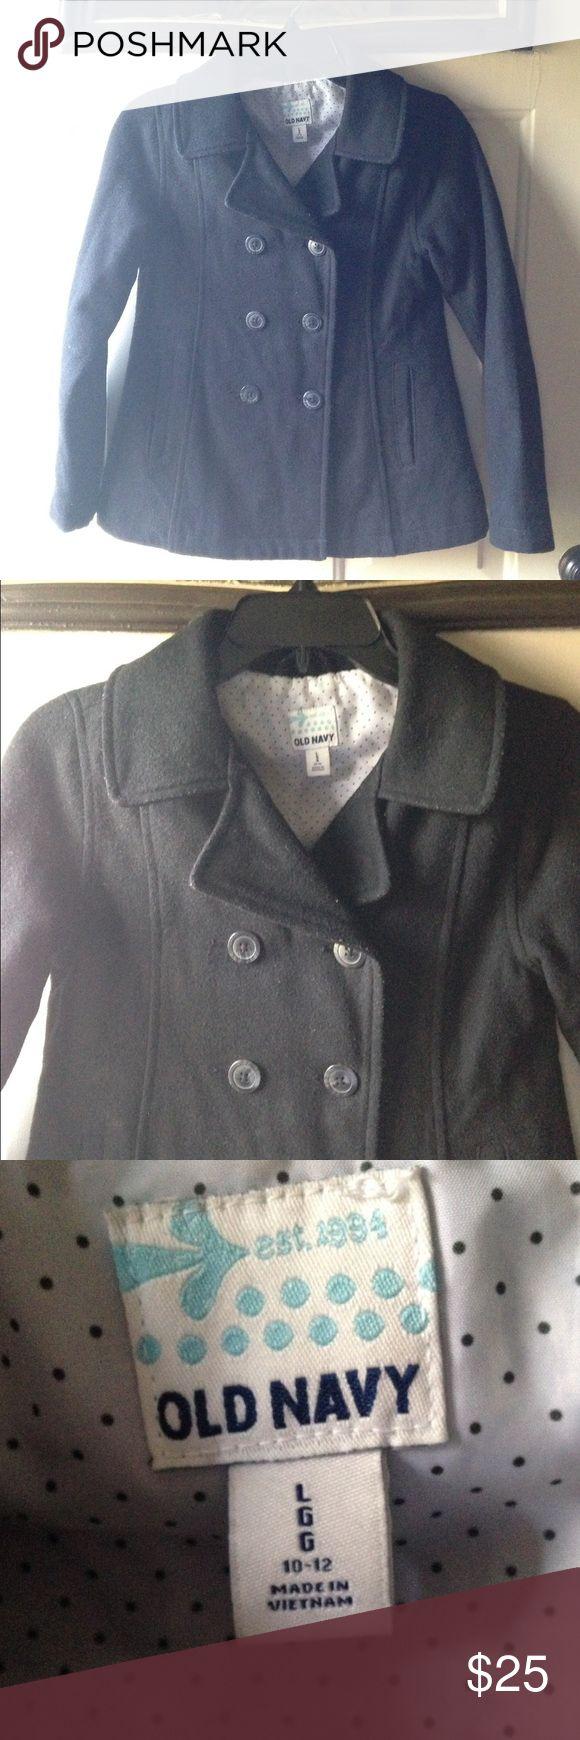 Girls Black Pea coat Jacket | Old Navy | Lg 10-12 Girls Black Pea coat Jacket from Old Navy. Size large (10-12) very good  condition Old Navy Jackets & Coats Pea Coats